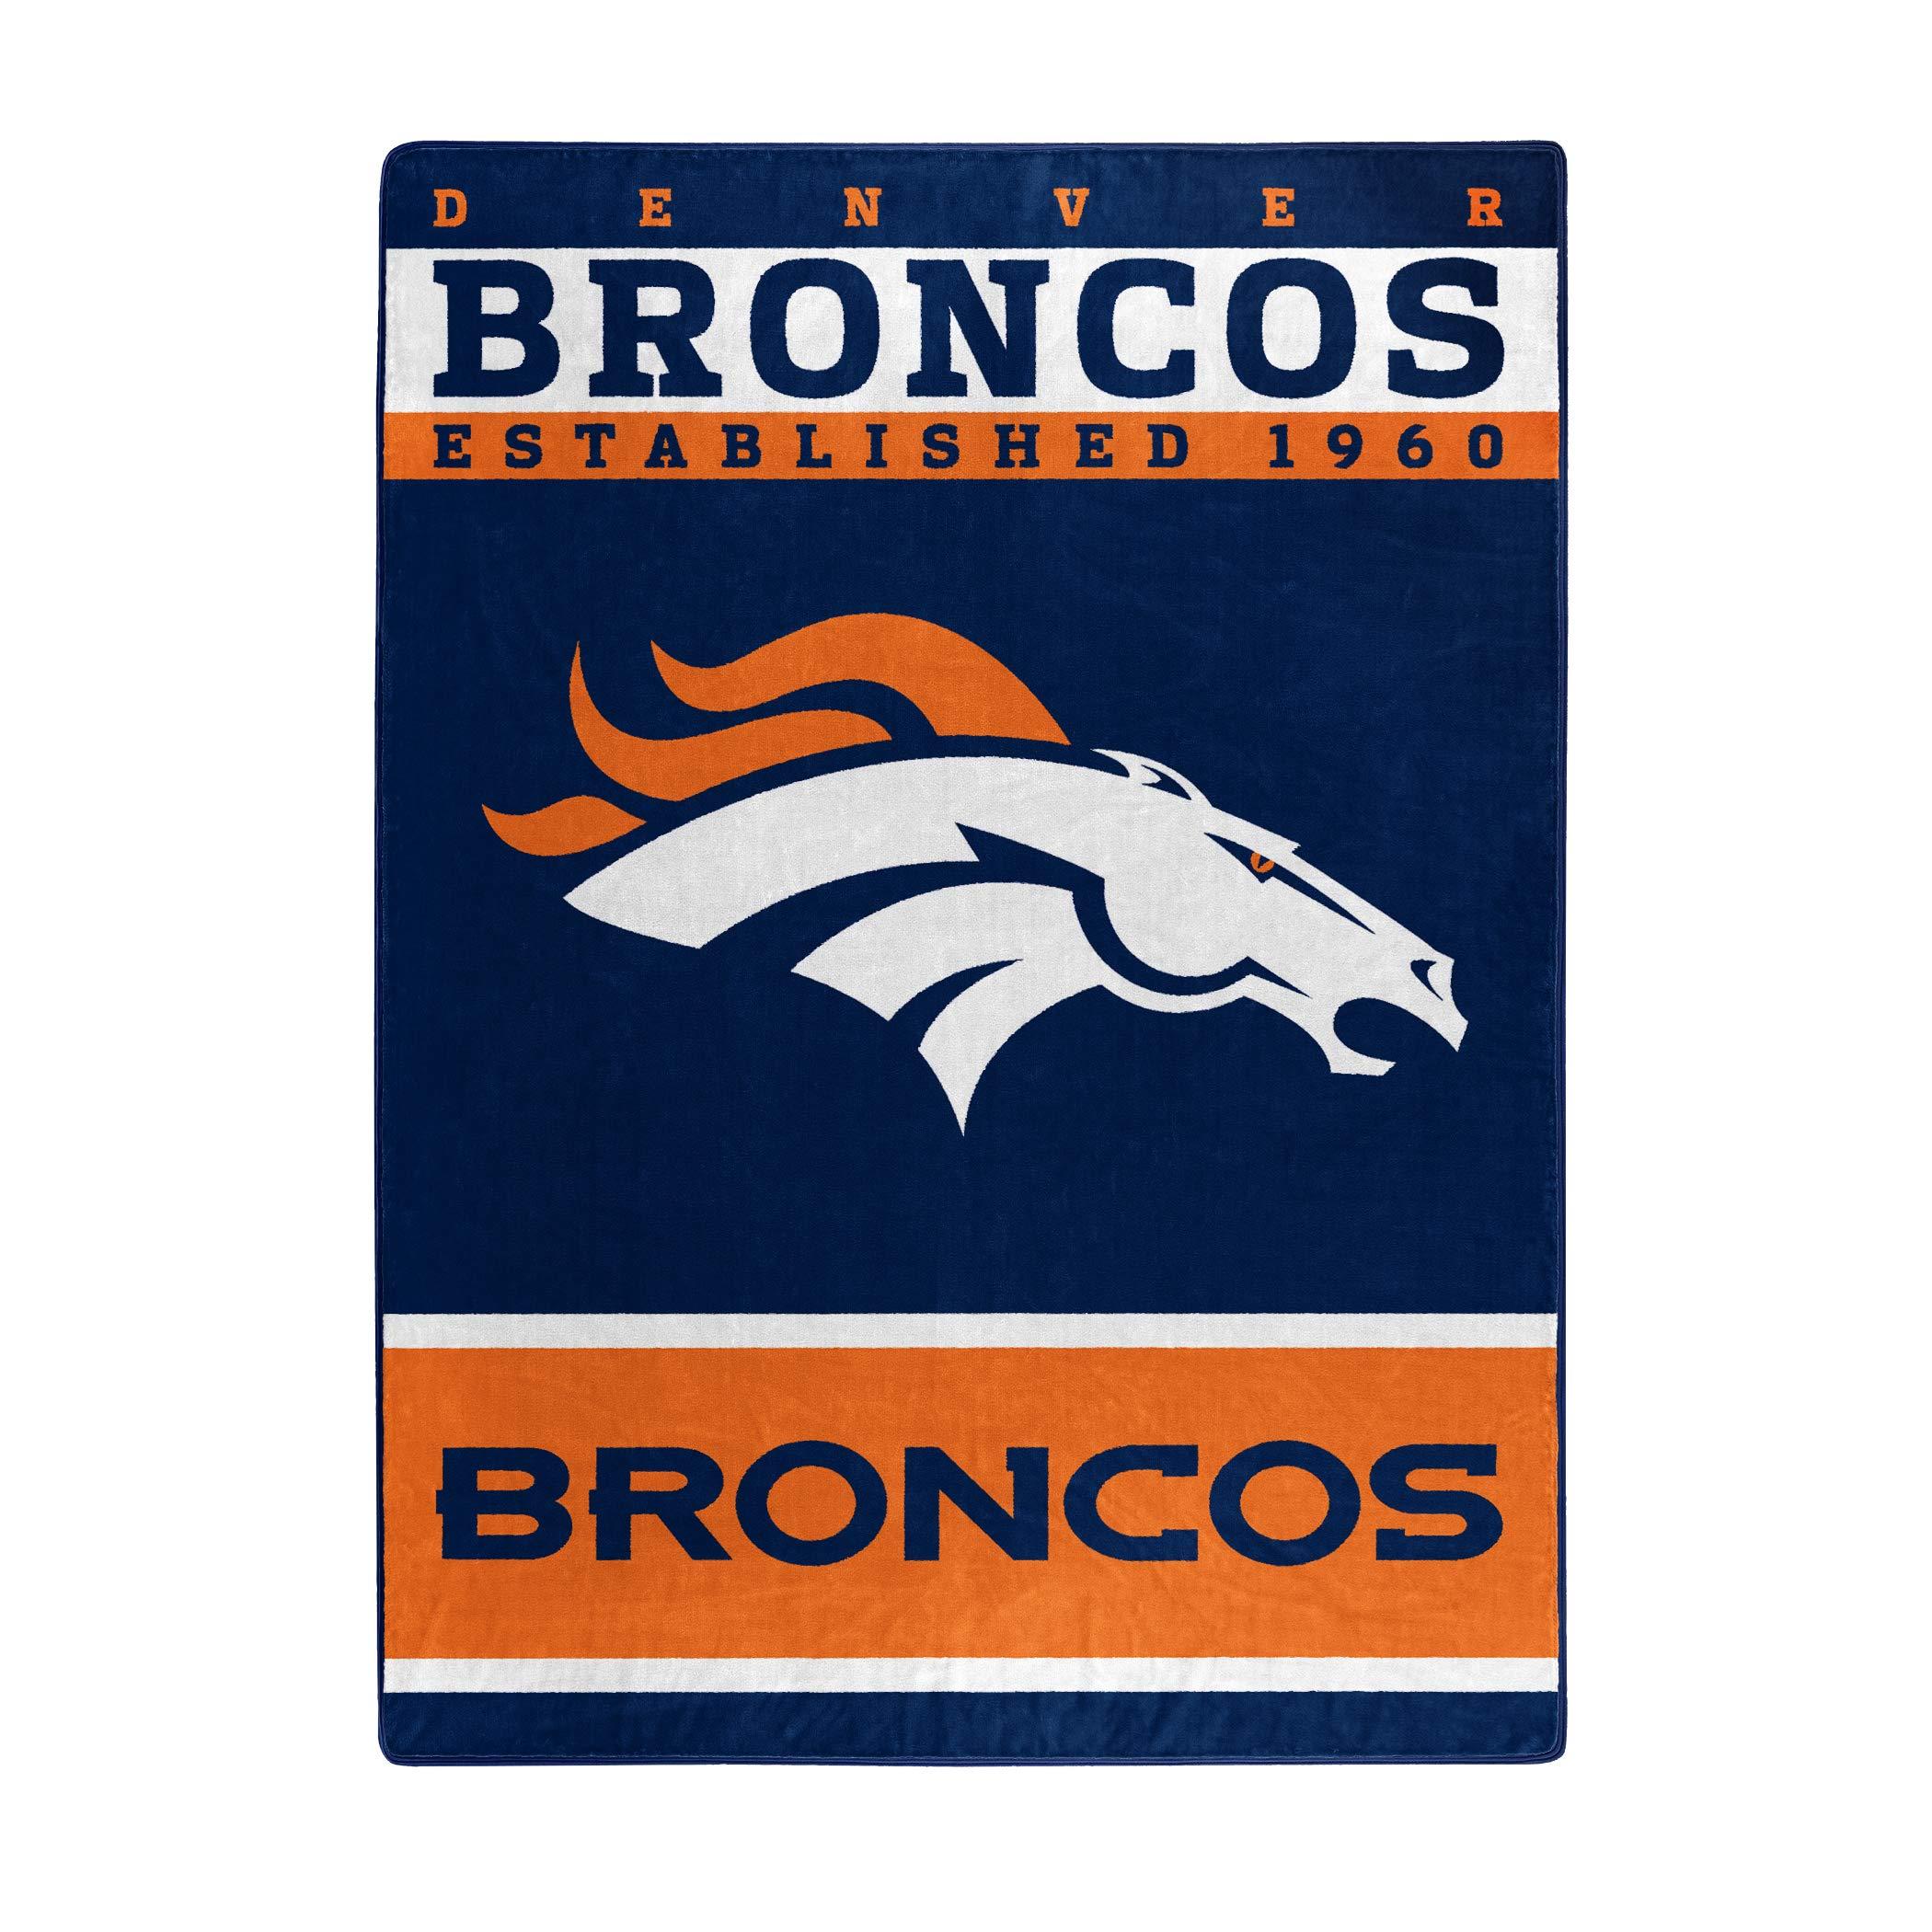 The Northwest Company Officially Licensed NFL Denver Broncos 12th Man Plush Raschel Throw Blanket, 60'' x 80''